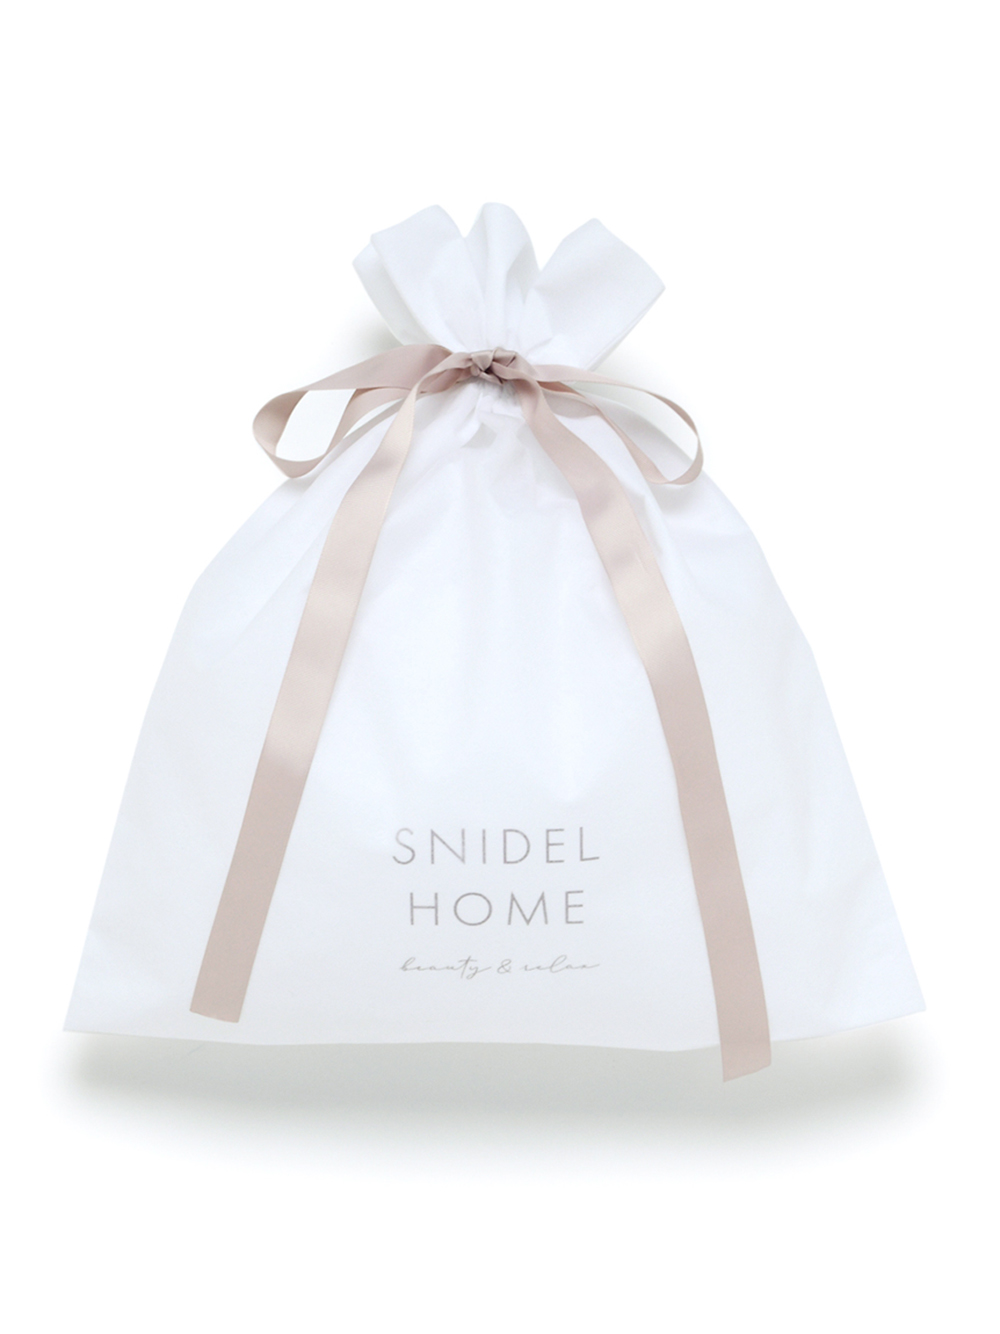 【SNIDEL HOME】ギフト巾着(LARGE)※ショッパー別売※